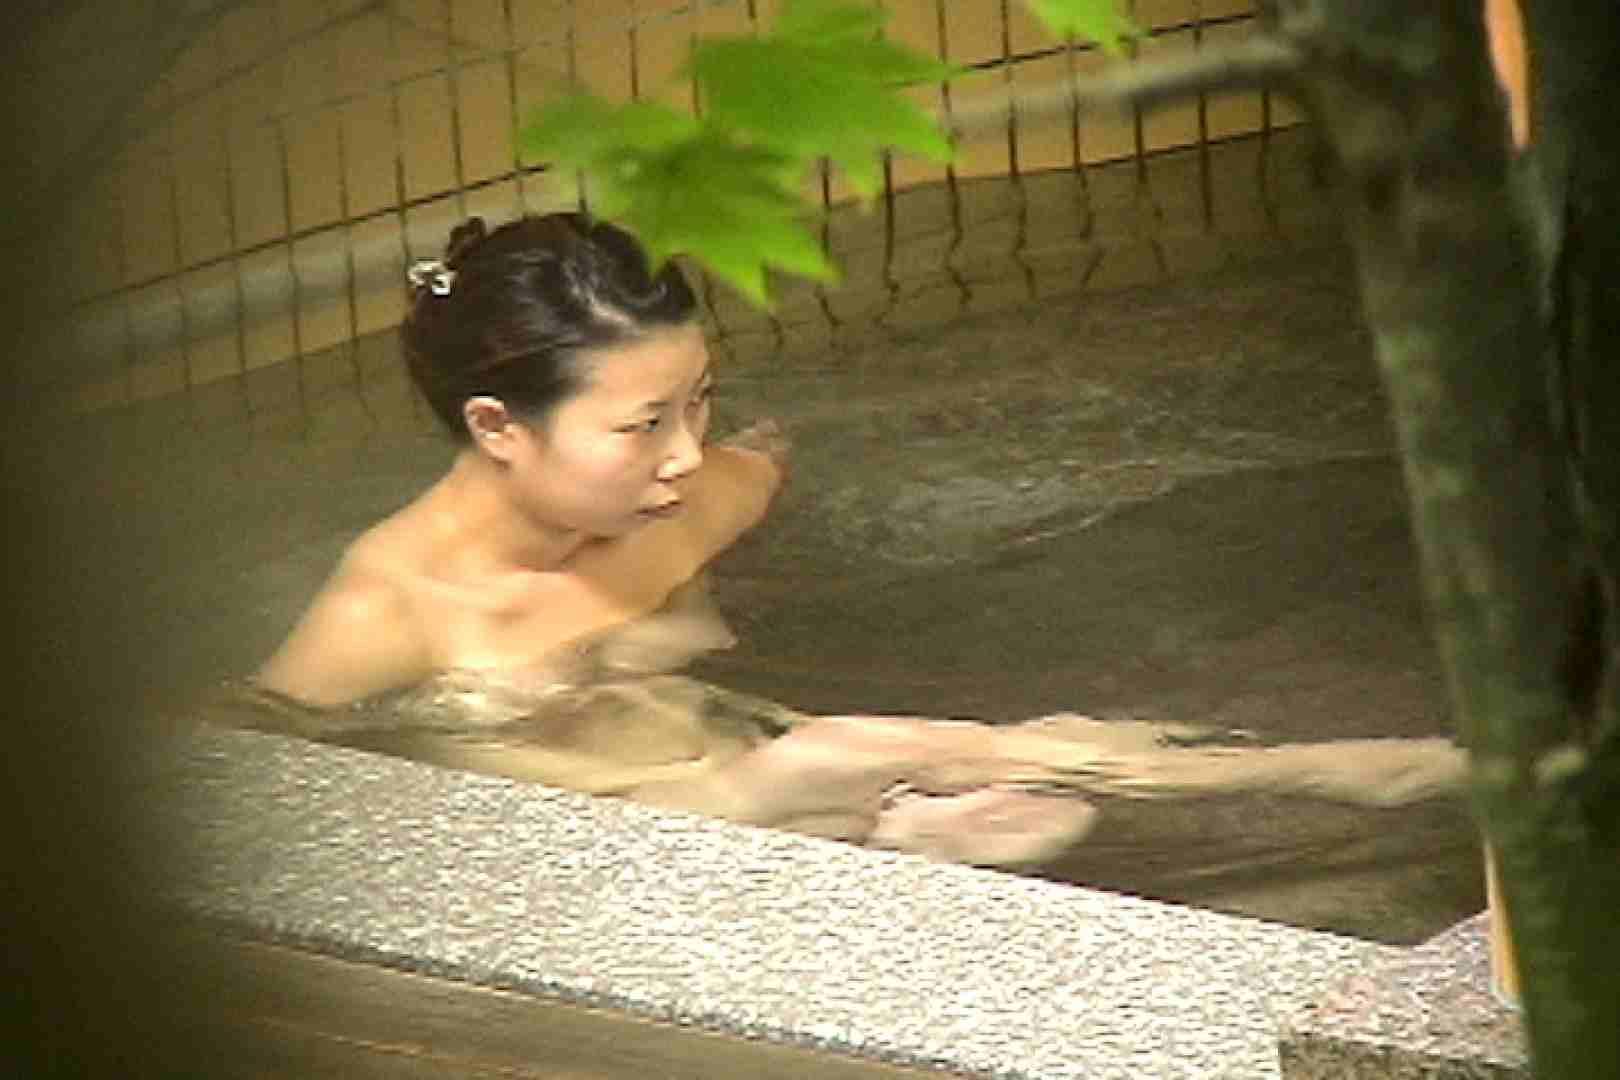 Aquaな露天風呂Vol.706 盗撮シリーズ | 露天風呂編  106PIX 53